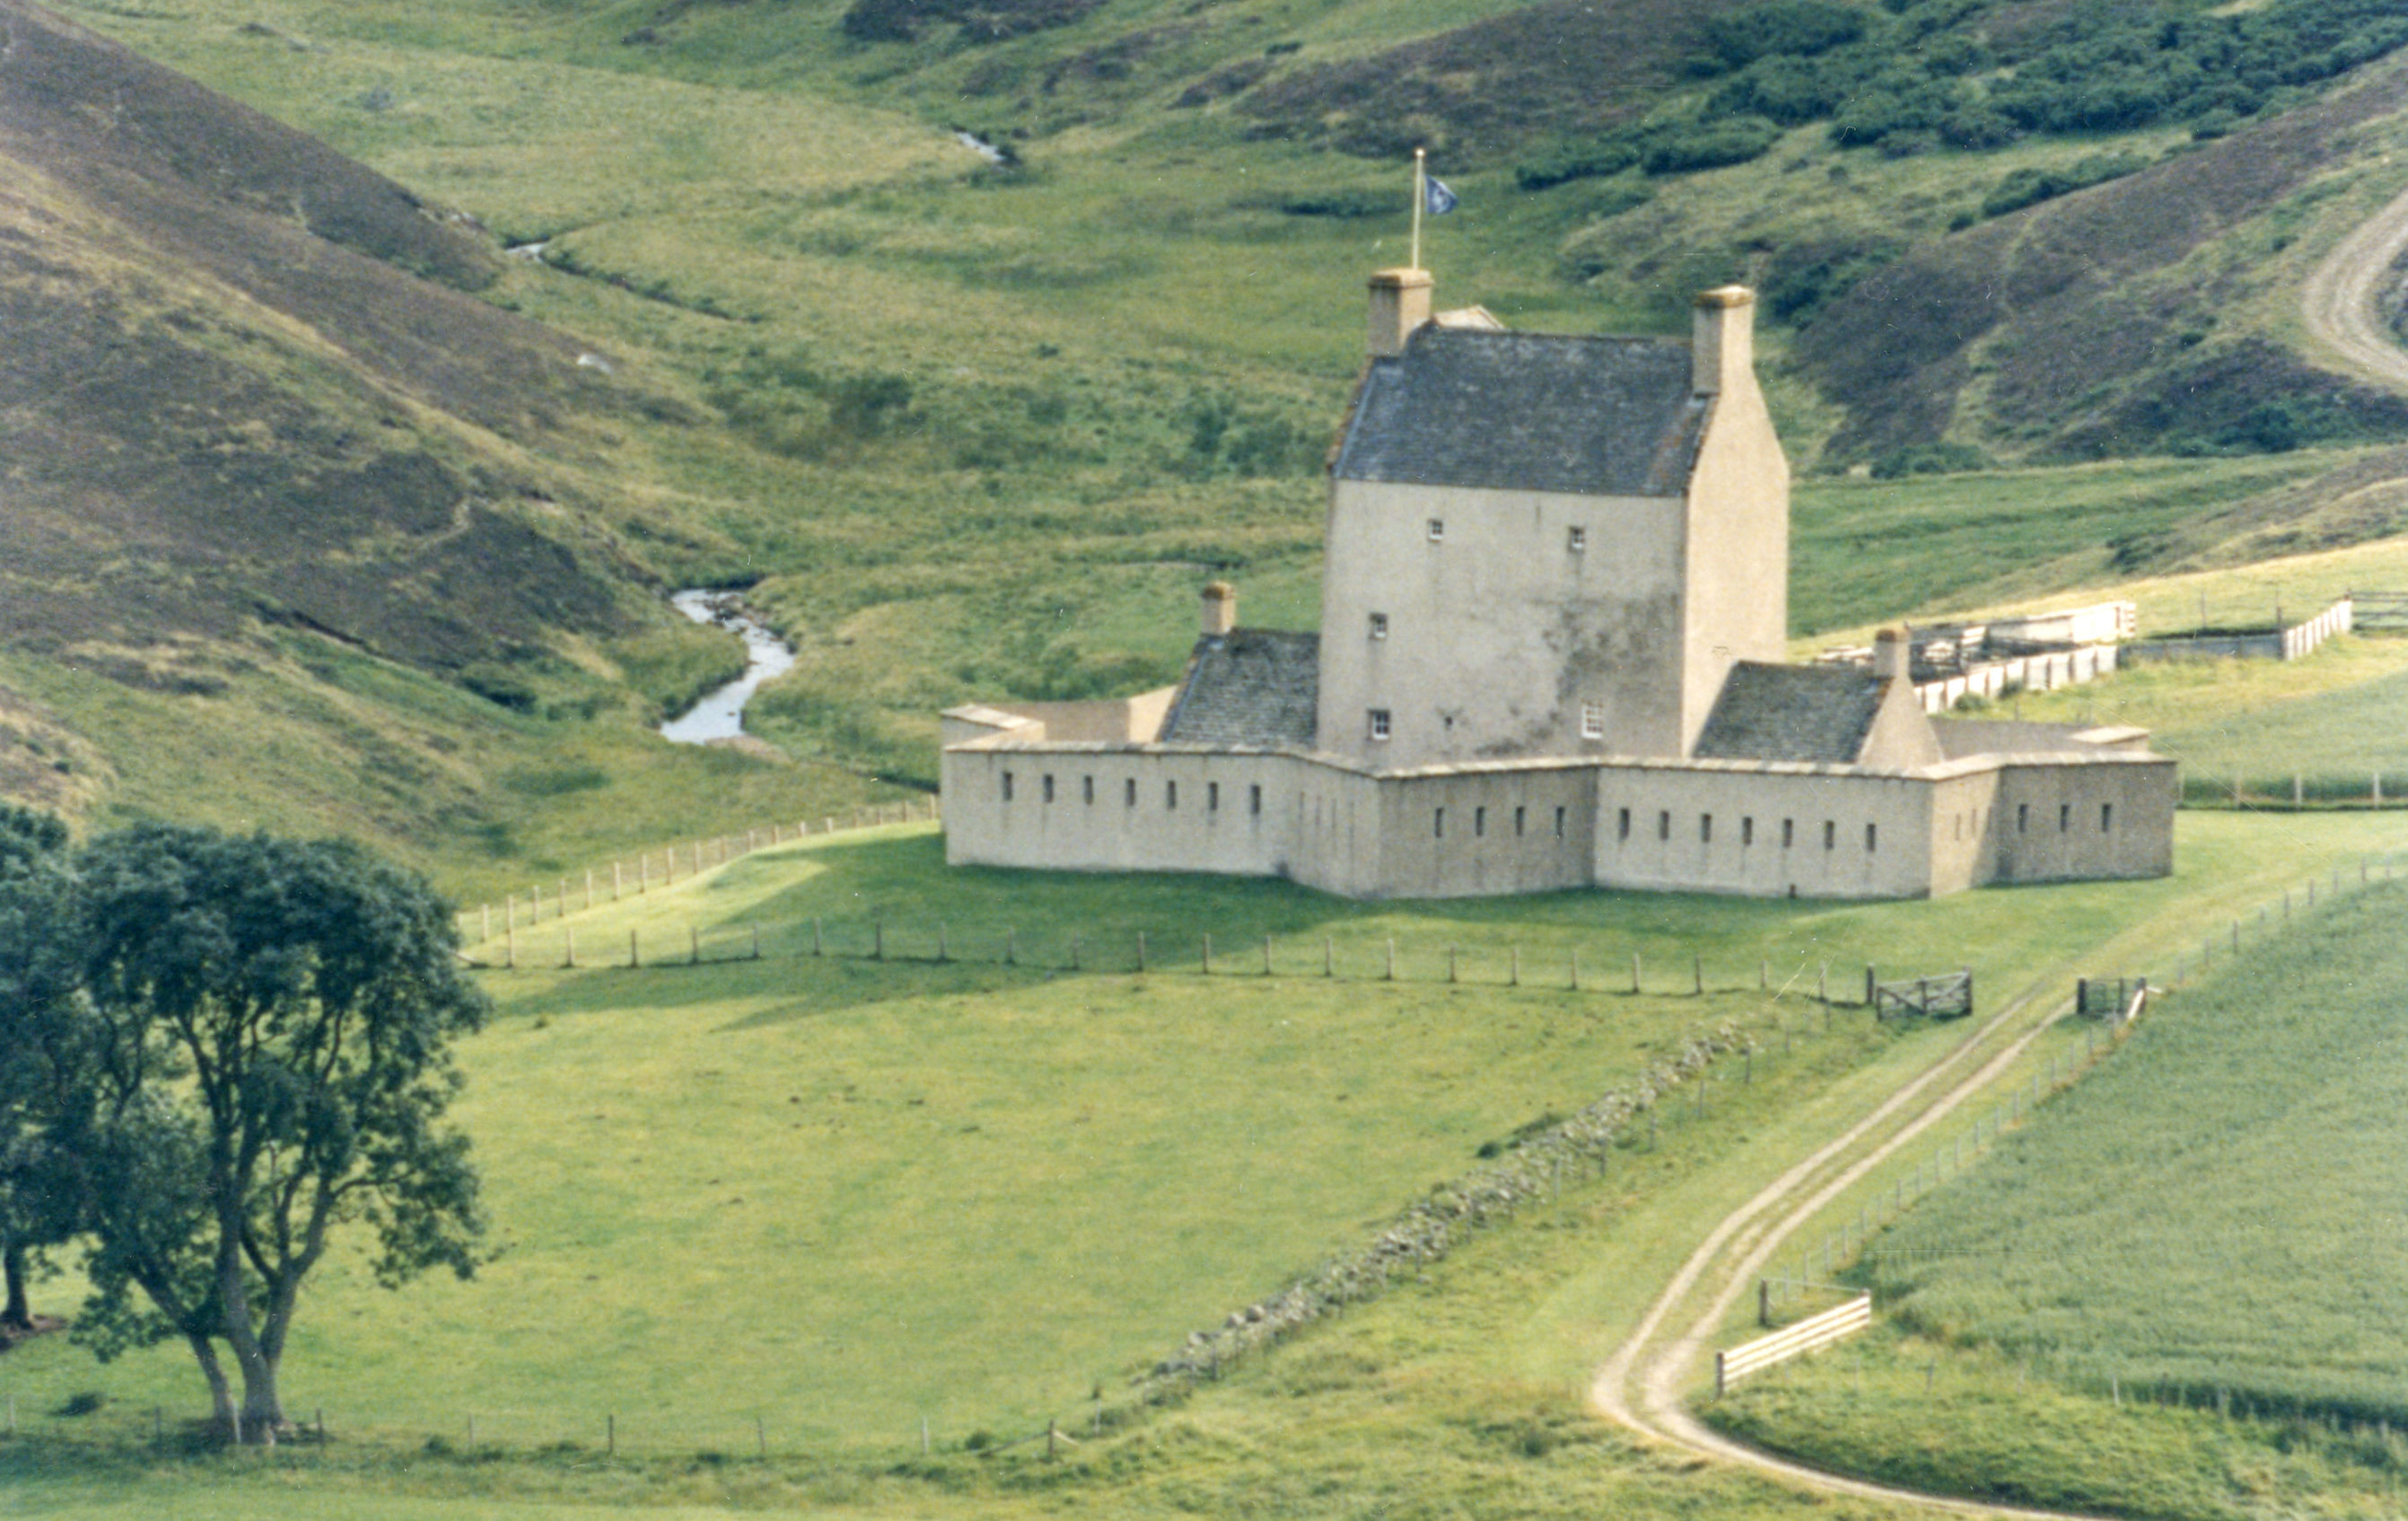 A view of Corgarff Castle, Strathdon taken in 1995.